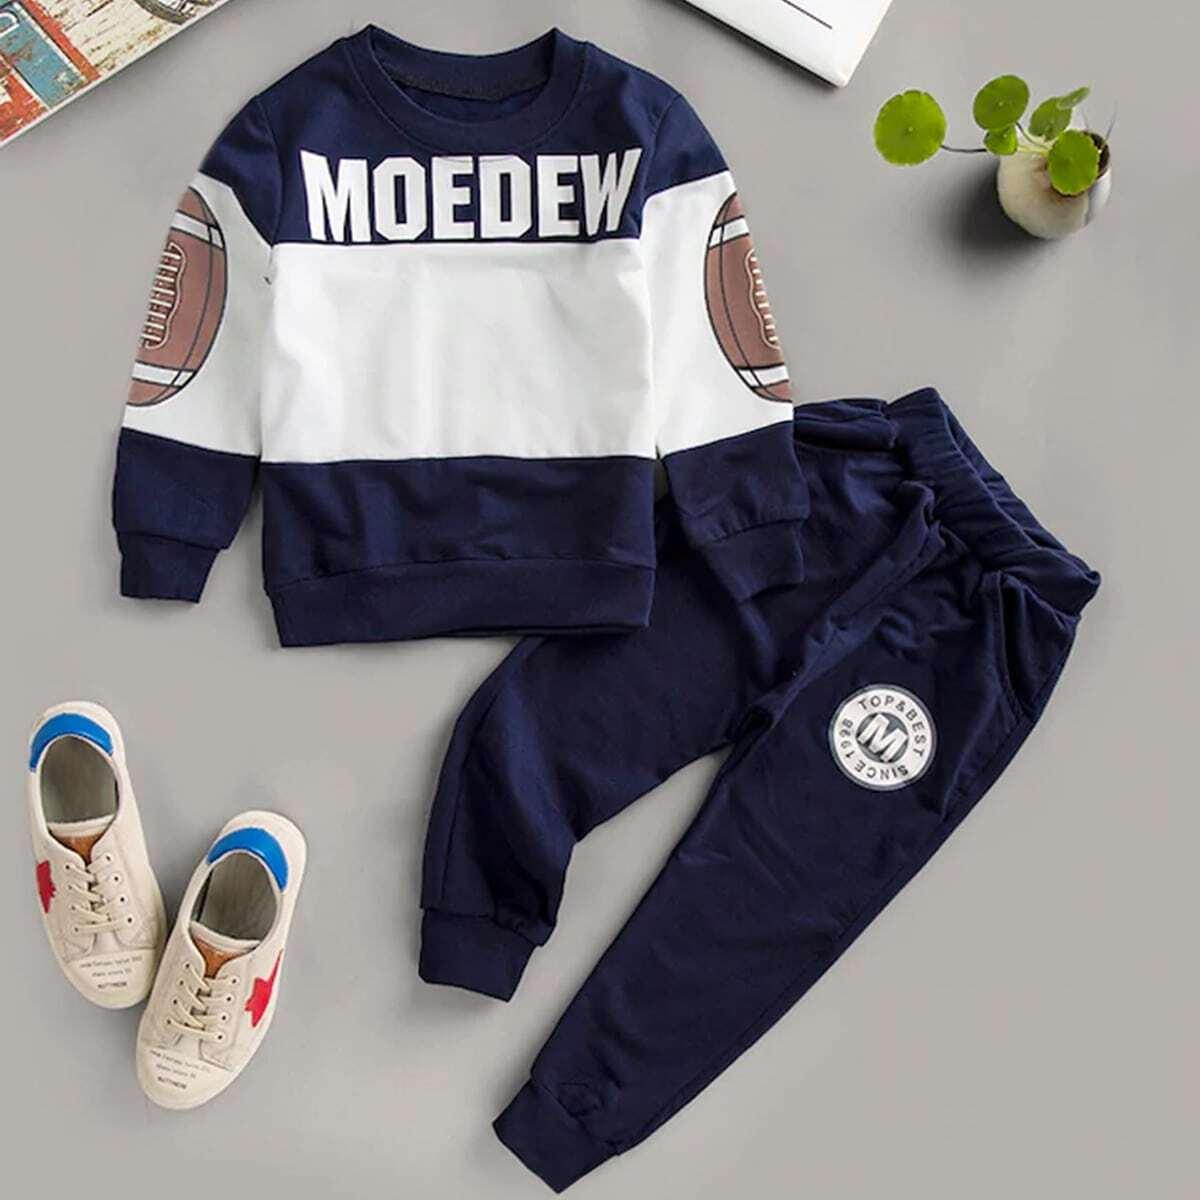 Tweekleurige sweatshirt met print en joggingbroek